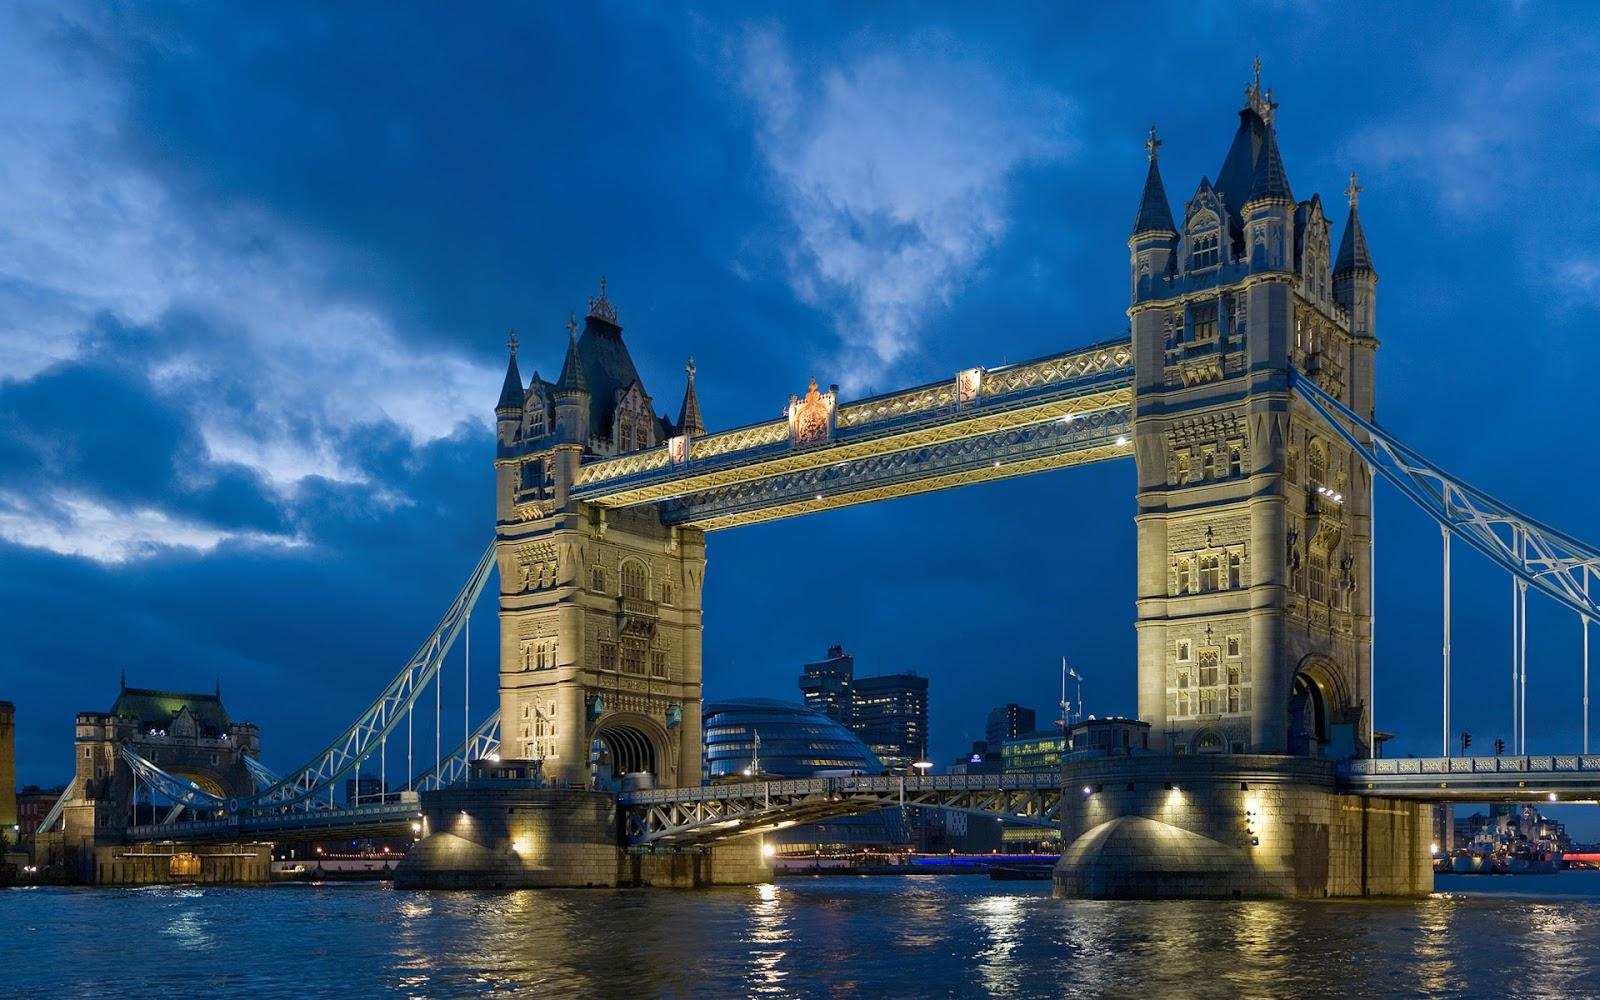 tower bridge of london hq full hd wallpapers free download ...